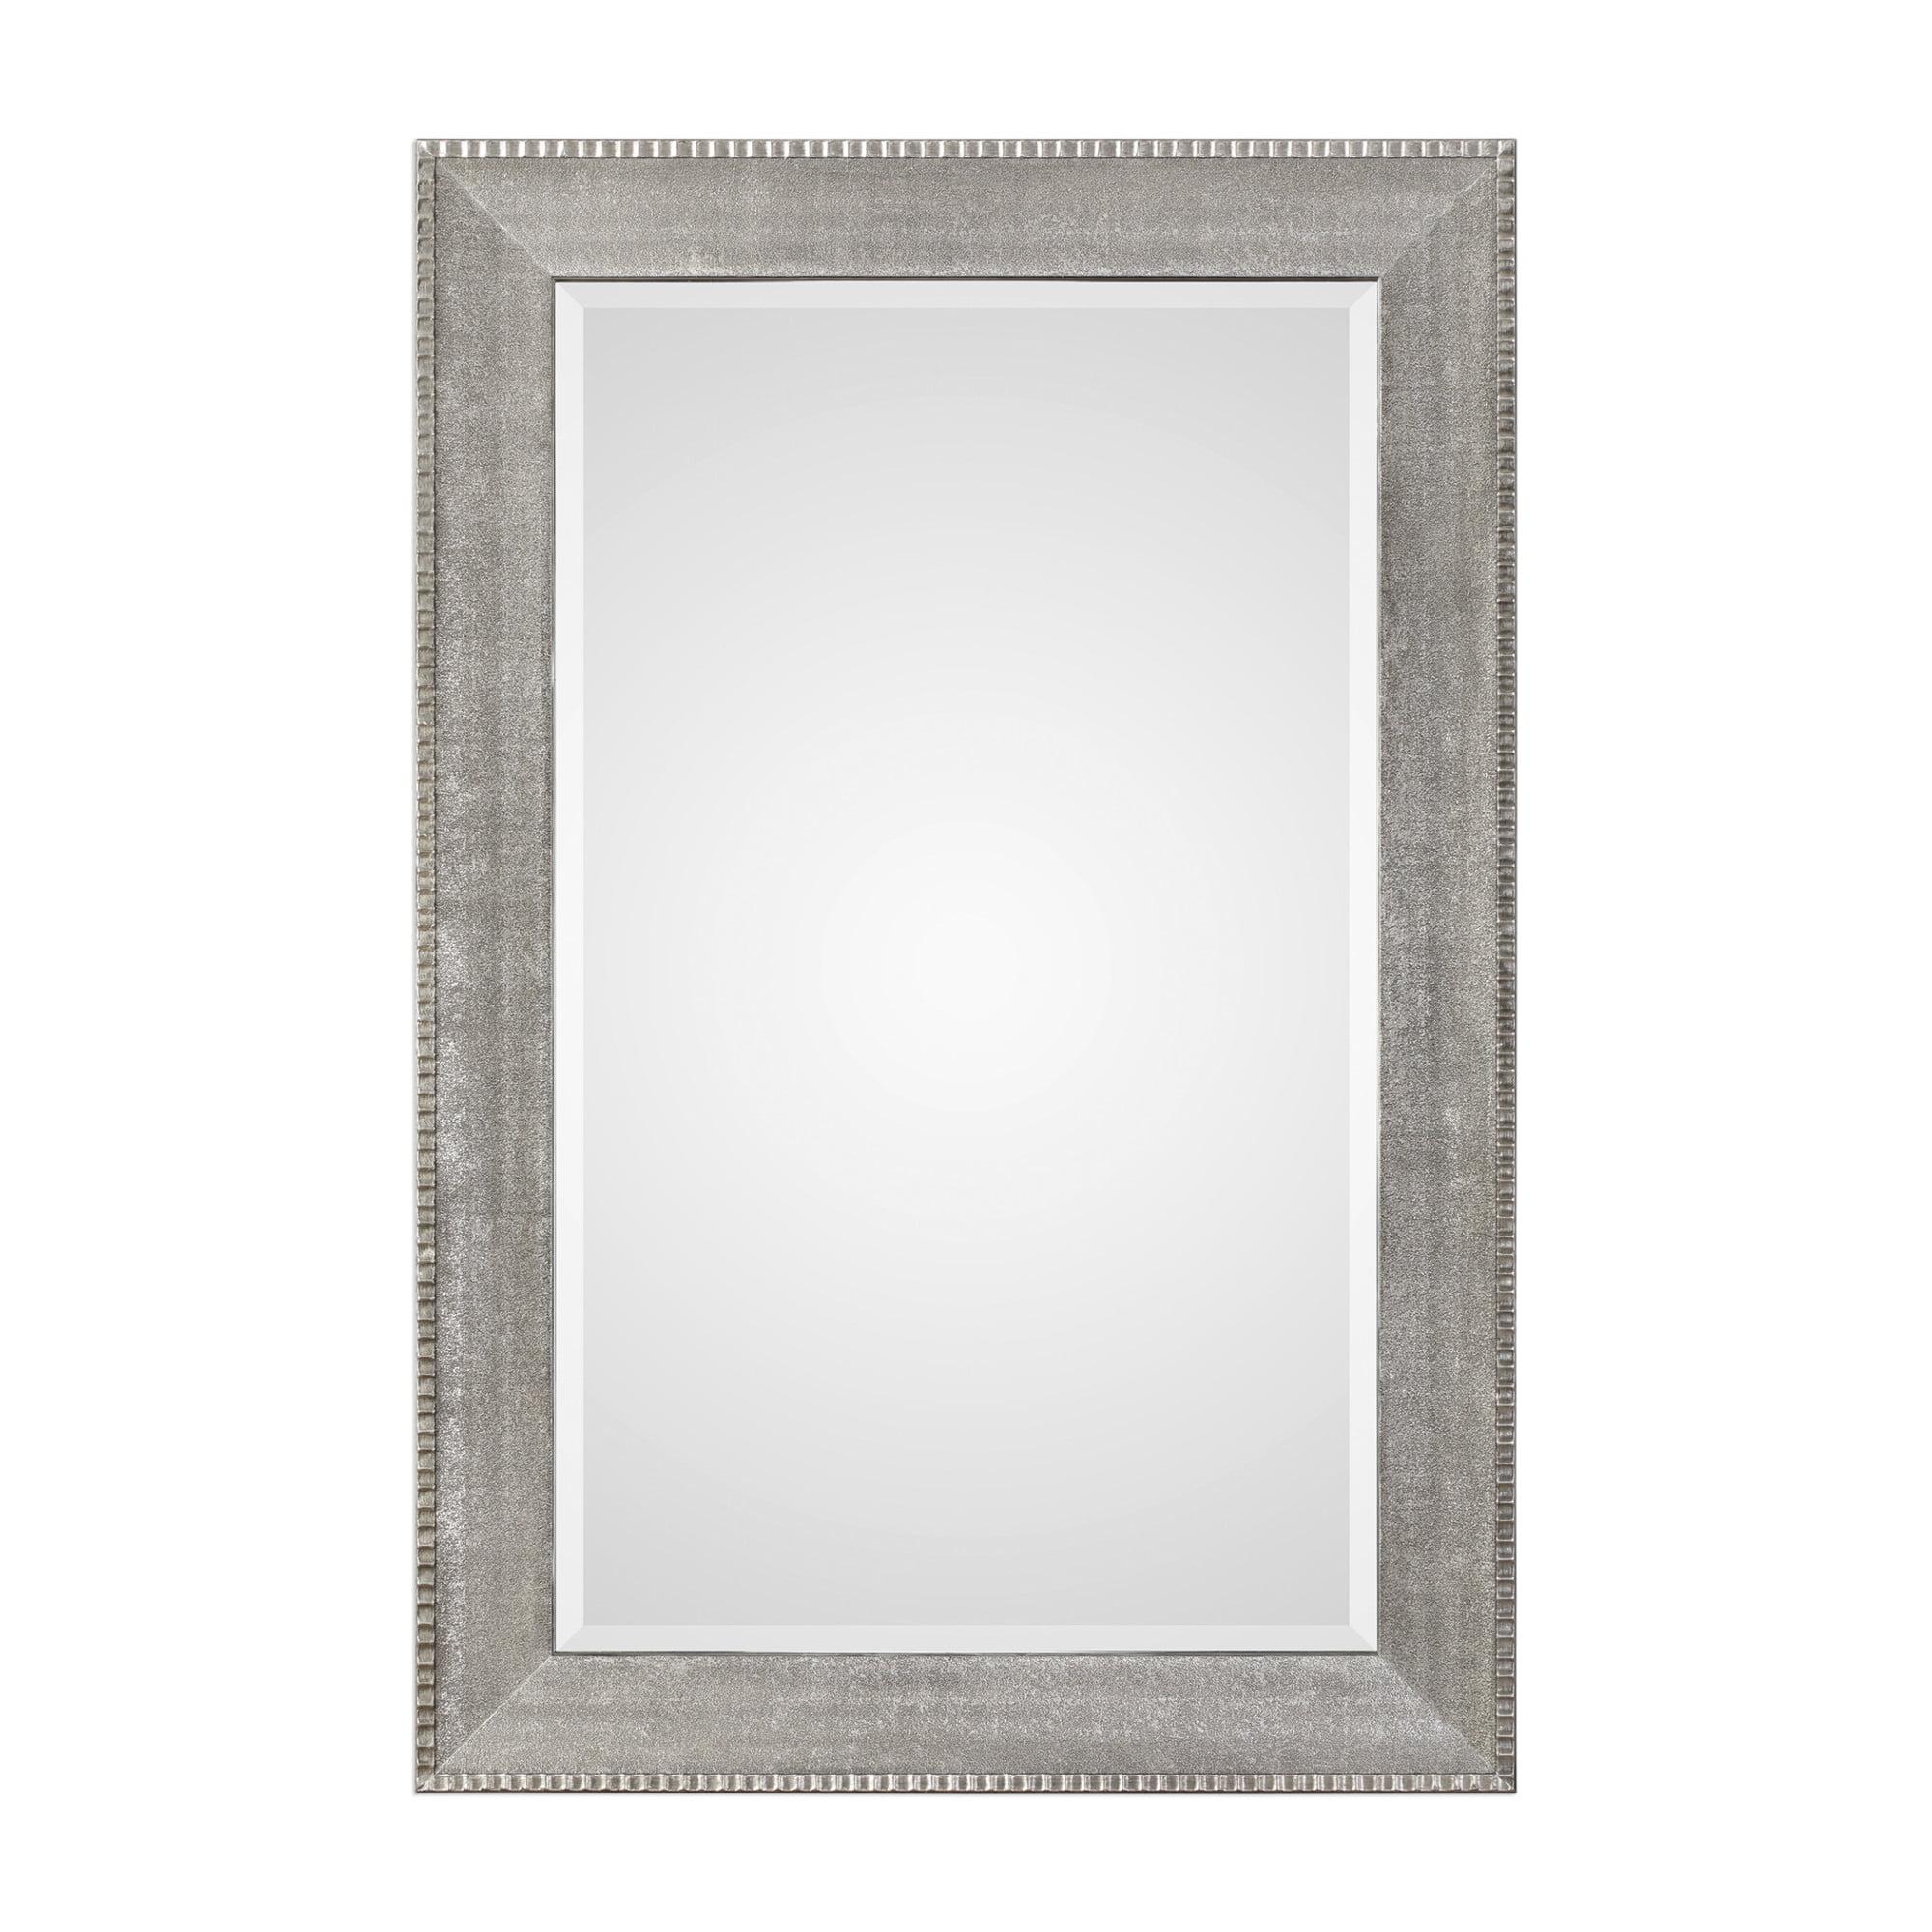 Uttermost 09370 Leiston Oversized Contemporary Portrait Full Length Wall Mirror Walmart Com Walmart Com